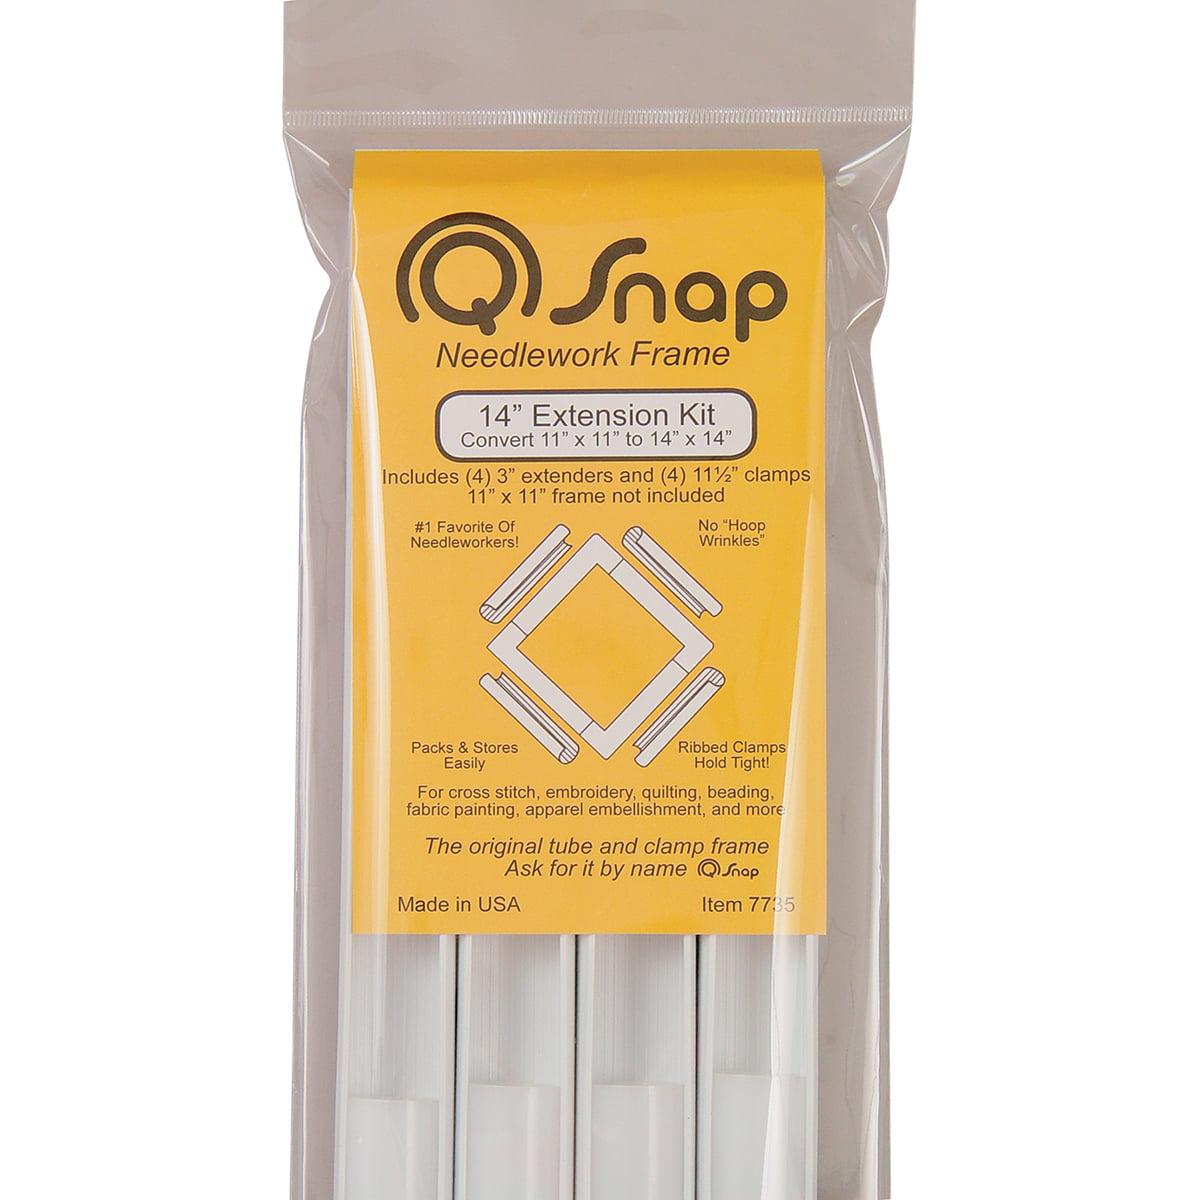 Q-Snap Lap Frame Extension Kit